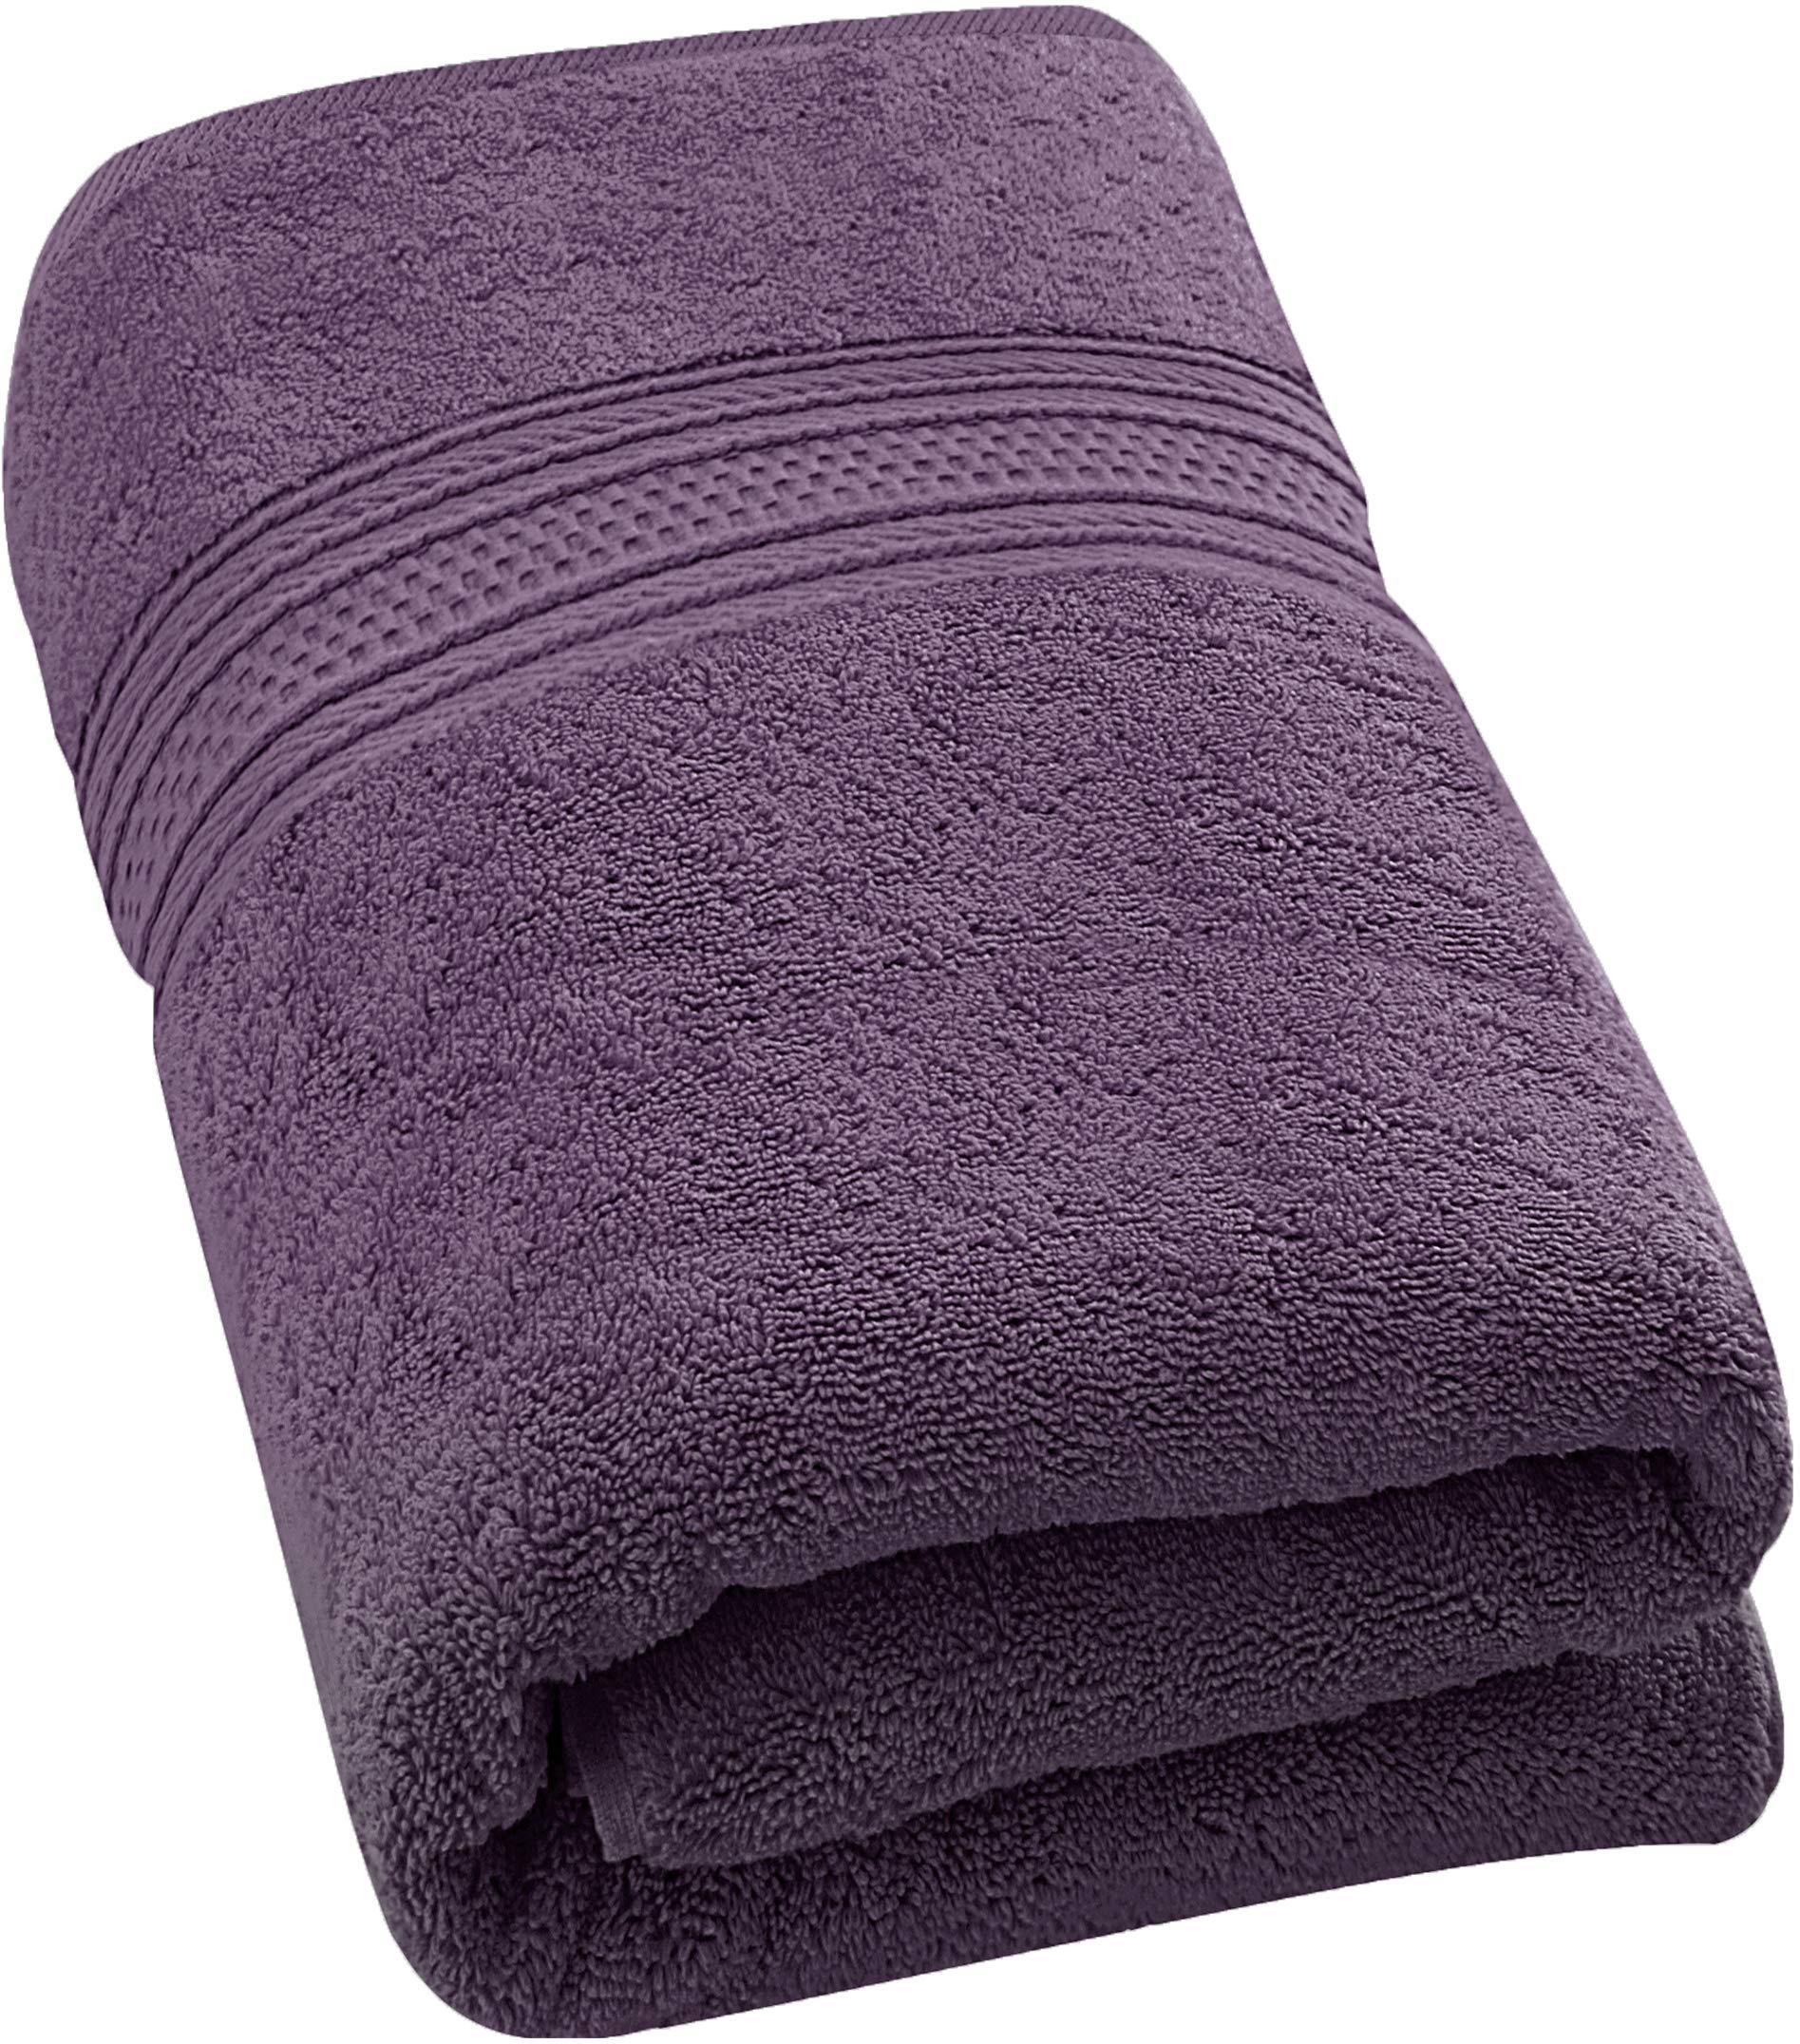 Utopia Towels 10 Pack 700 GSM Extra Large Bath Towels Bulk (35 x 70 Inches) Soft Luxury Bath Sheet, Plum